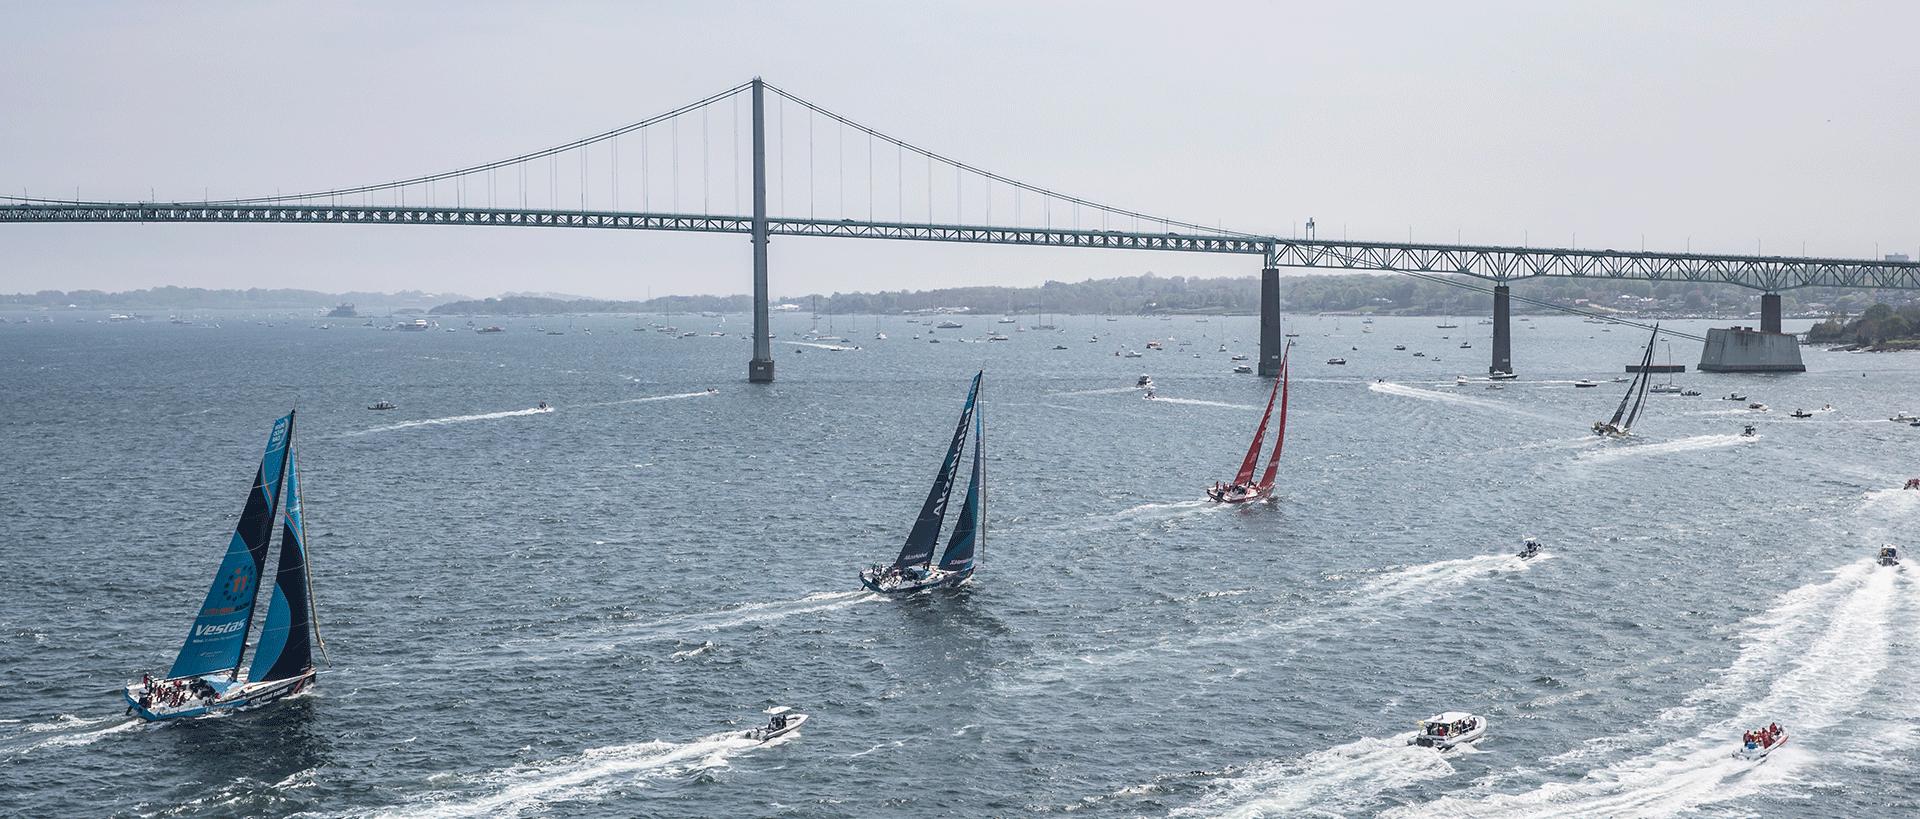 The Ocean Race announces North American stopover in the city of Newport, Rhode Island. Photo credit: Ainhoa Sanchez/Volvo AB